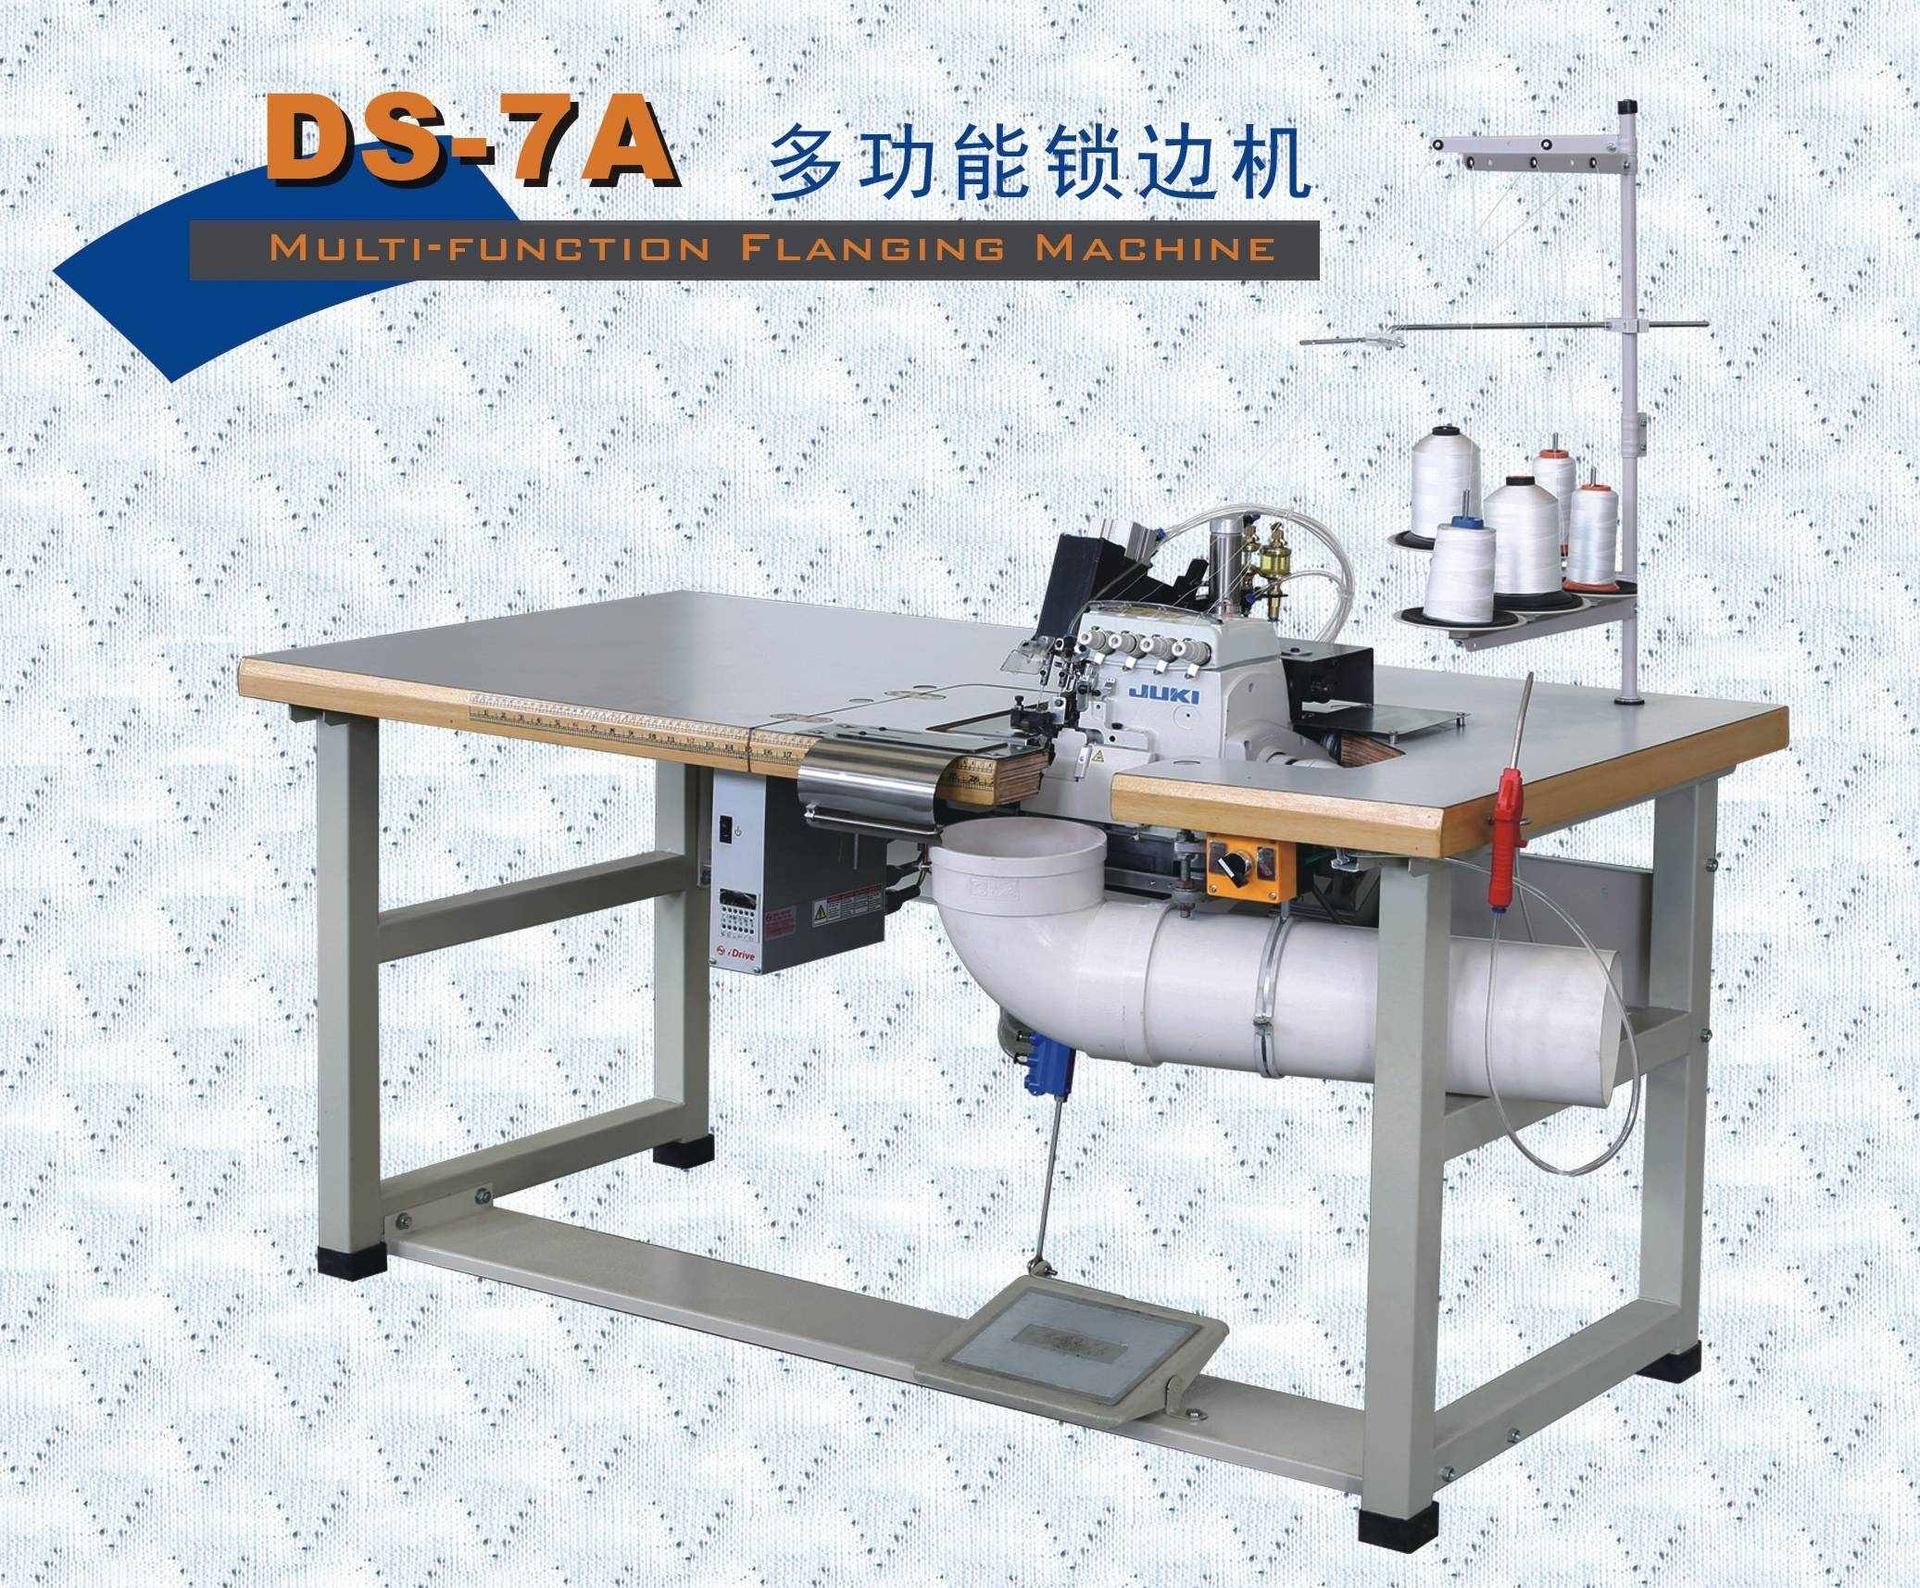 DS-7A多功能锁边机